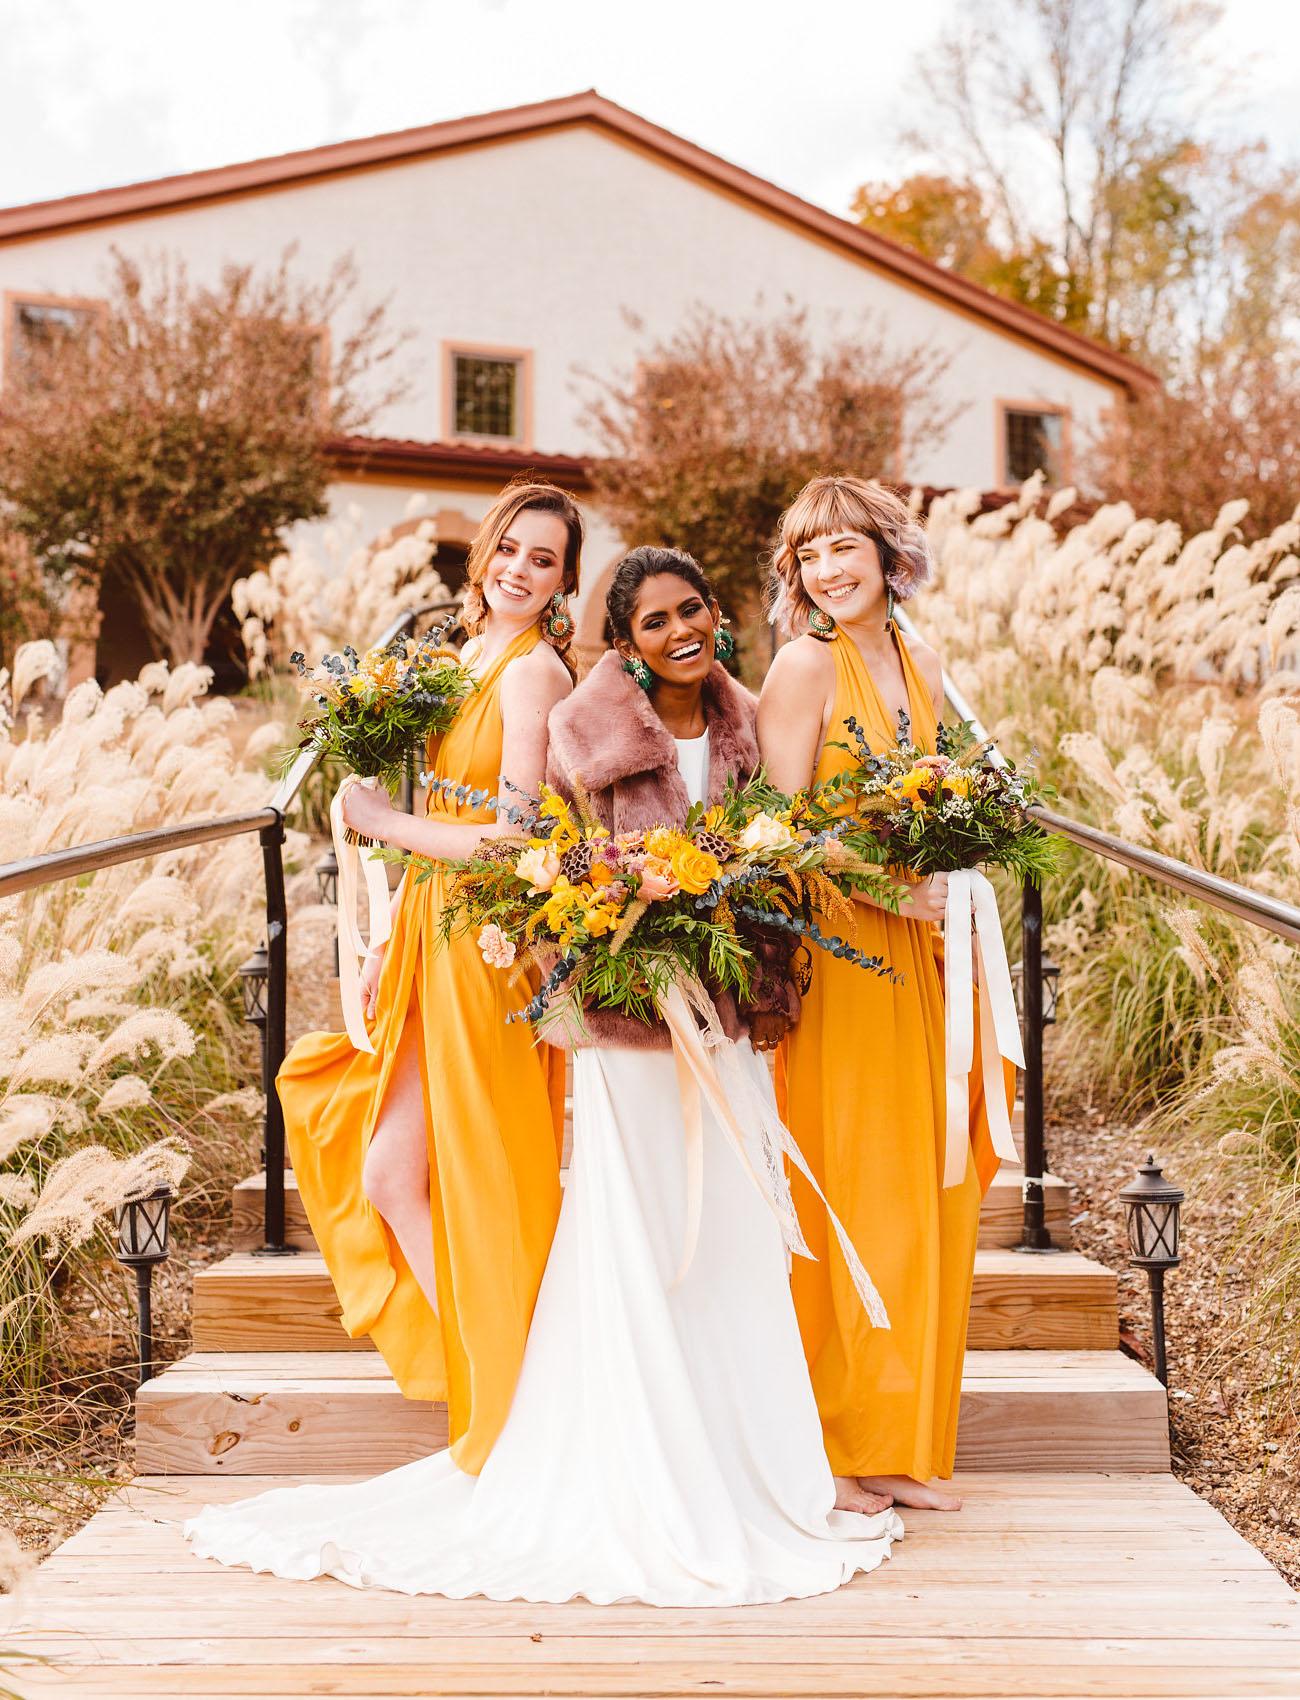 51ff04374e857 Cheap bridesmaid dresses, simple jersey bridesmaid dresses, yellow  bridesmaid dresses,PD21153